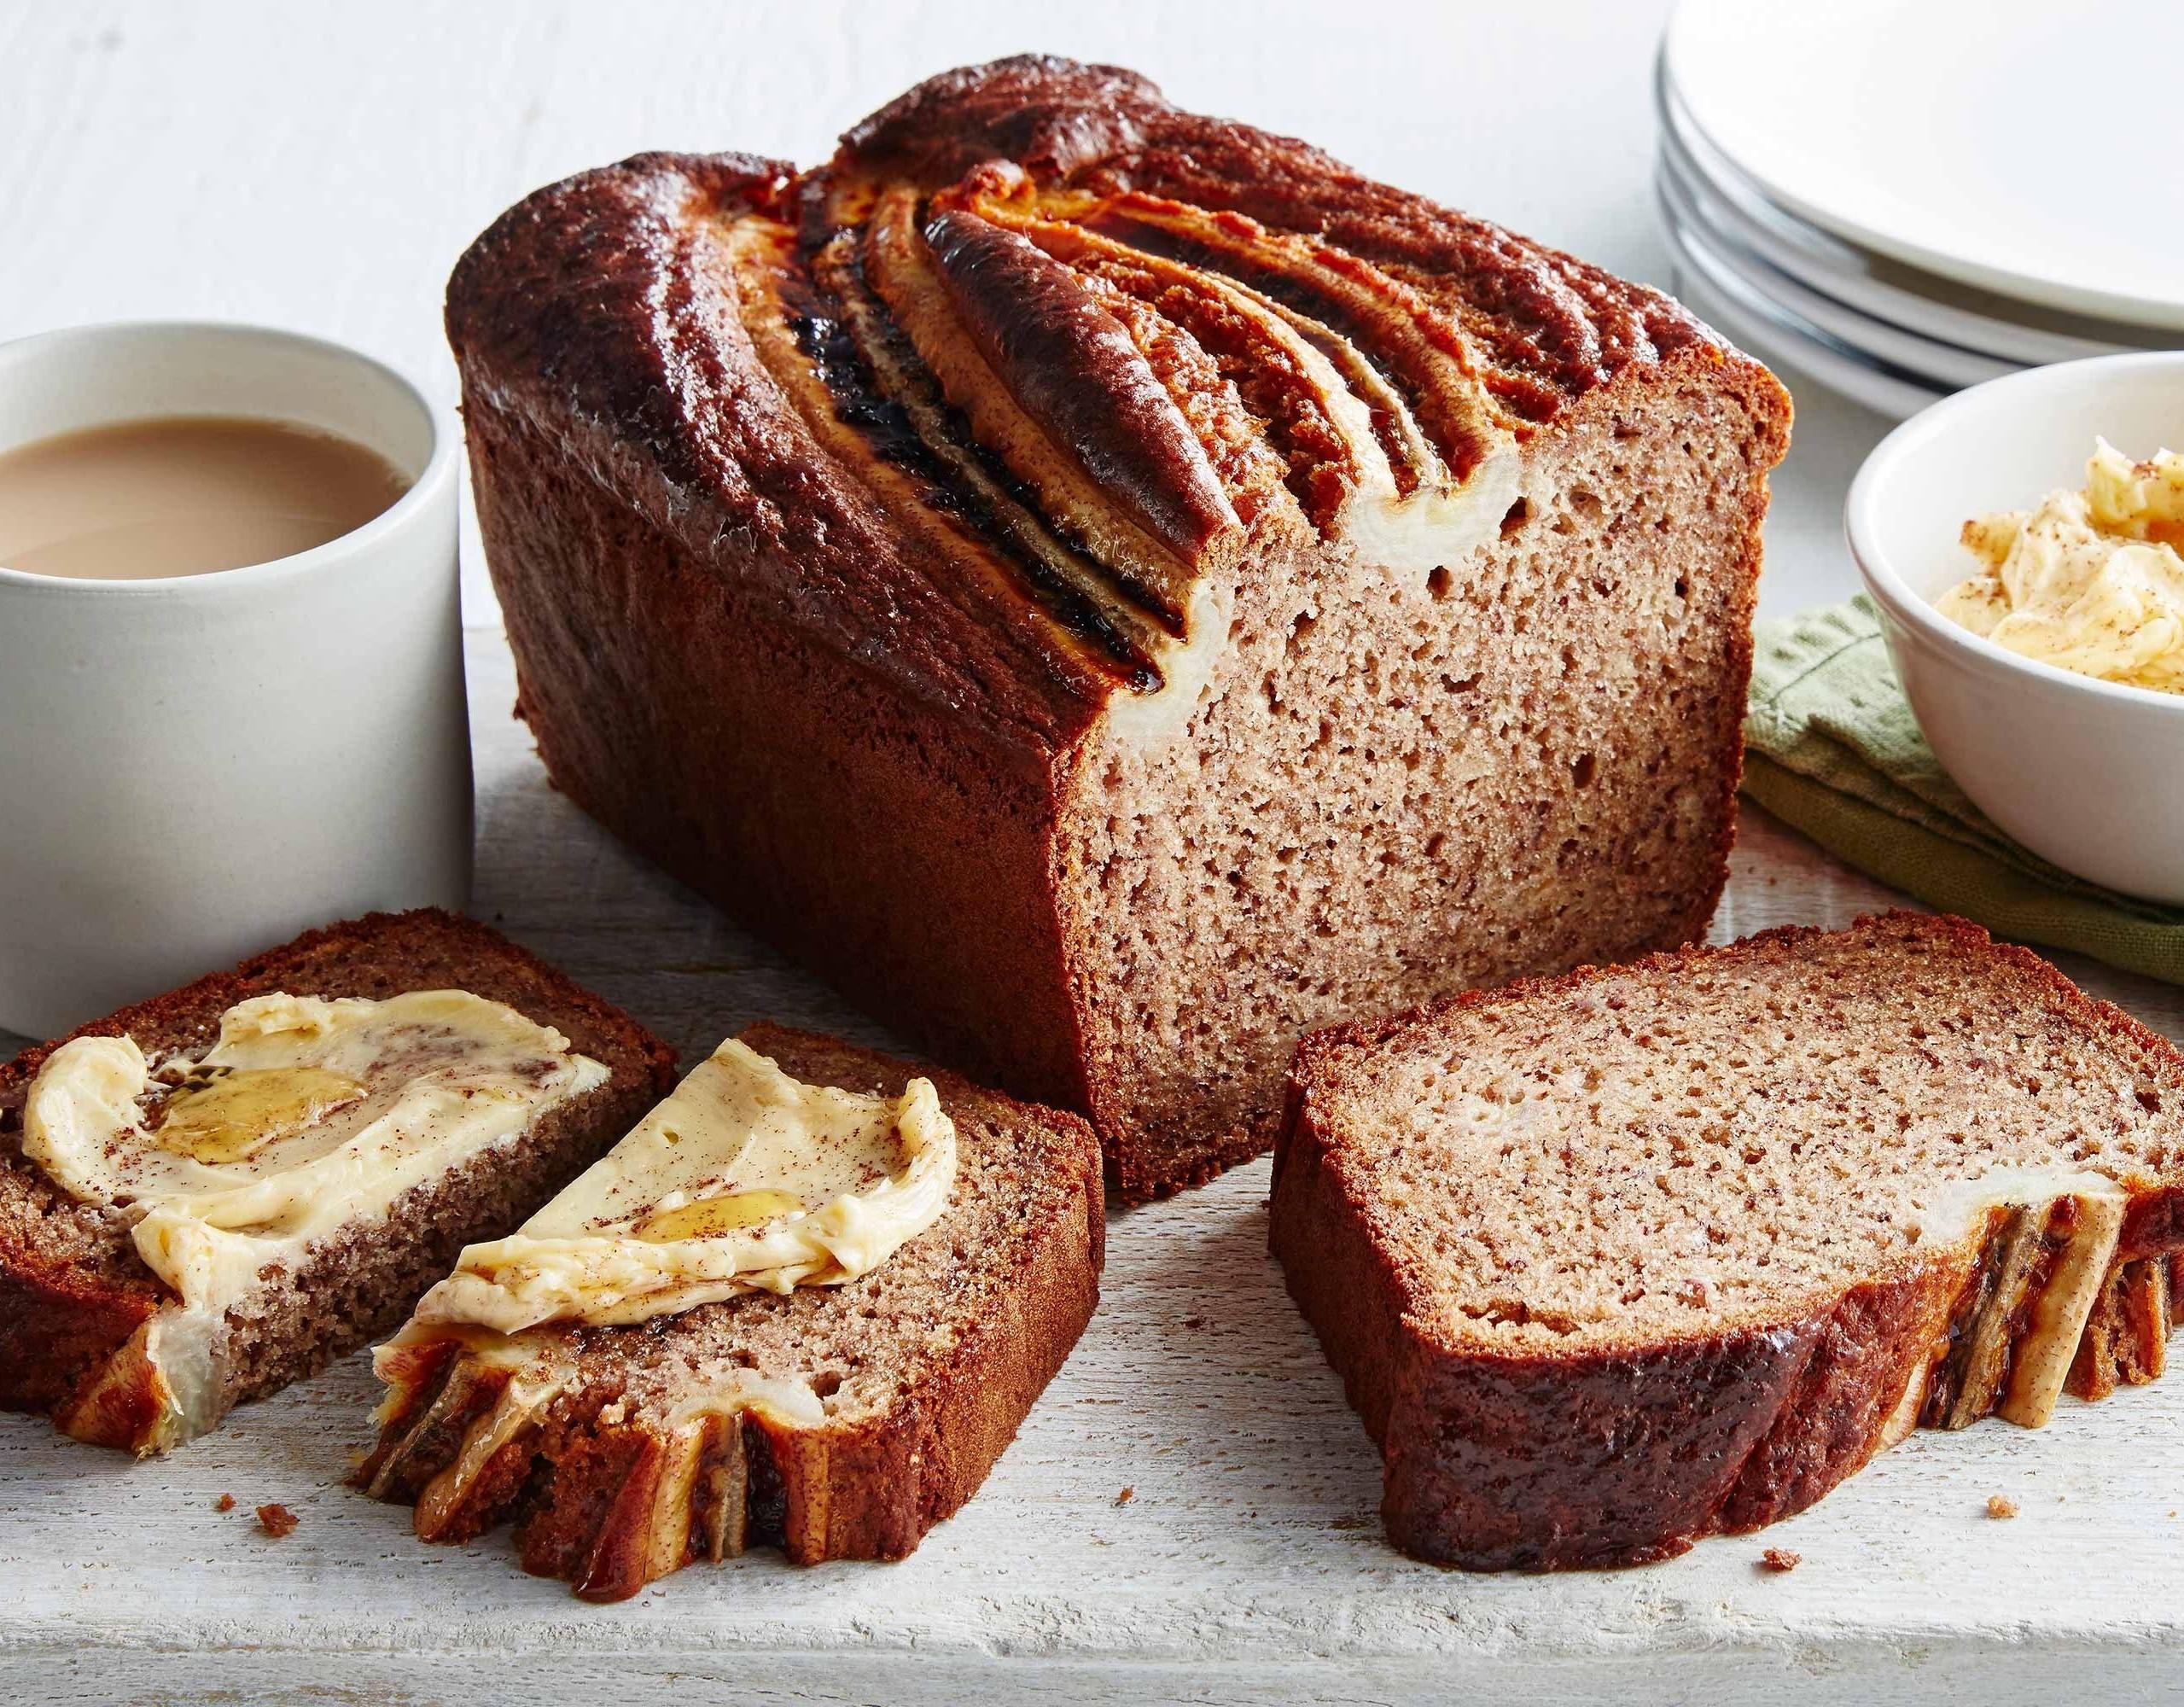 Chai spiced banana bread | 12 Cozy Fall Breakfast Ideas | Her Beauty